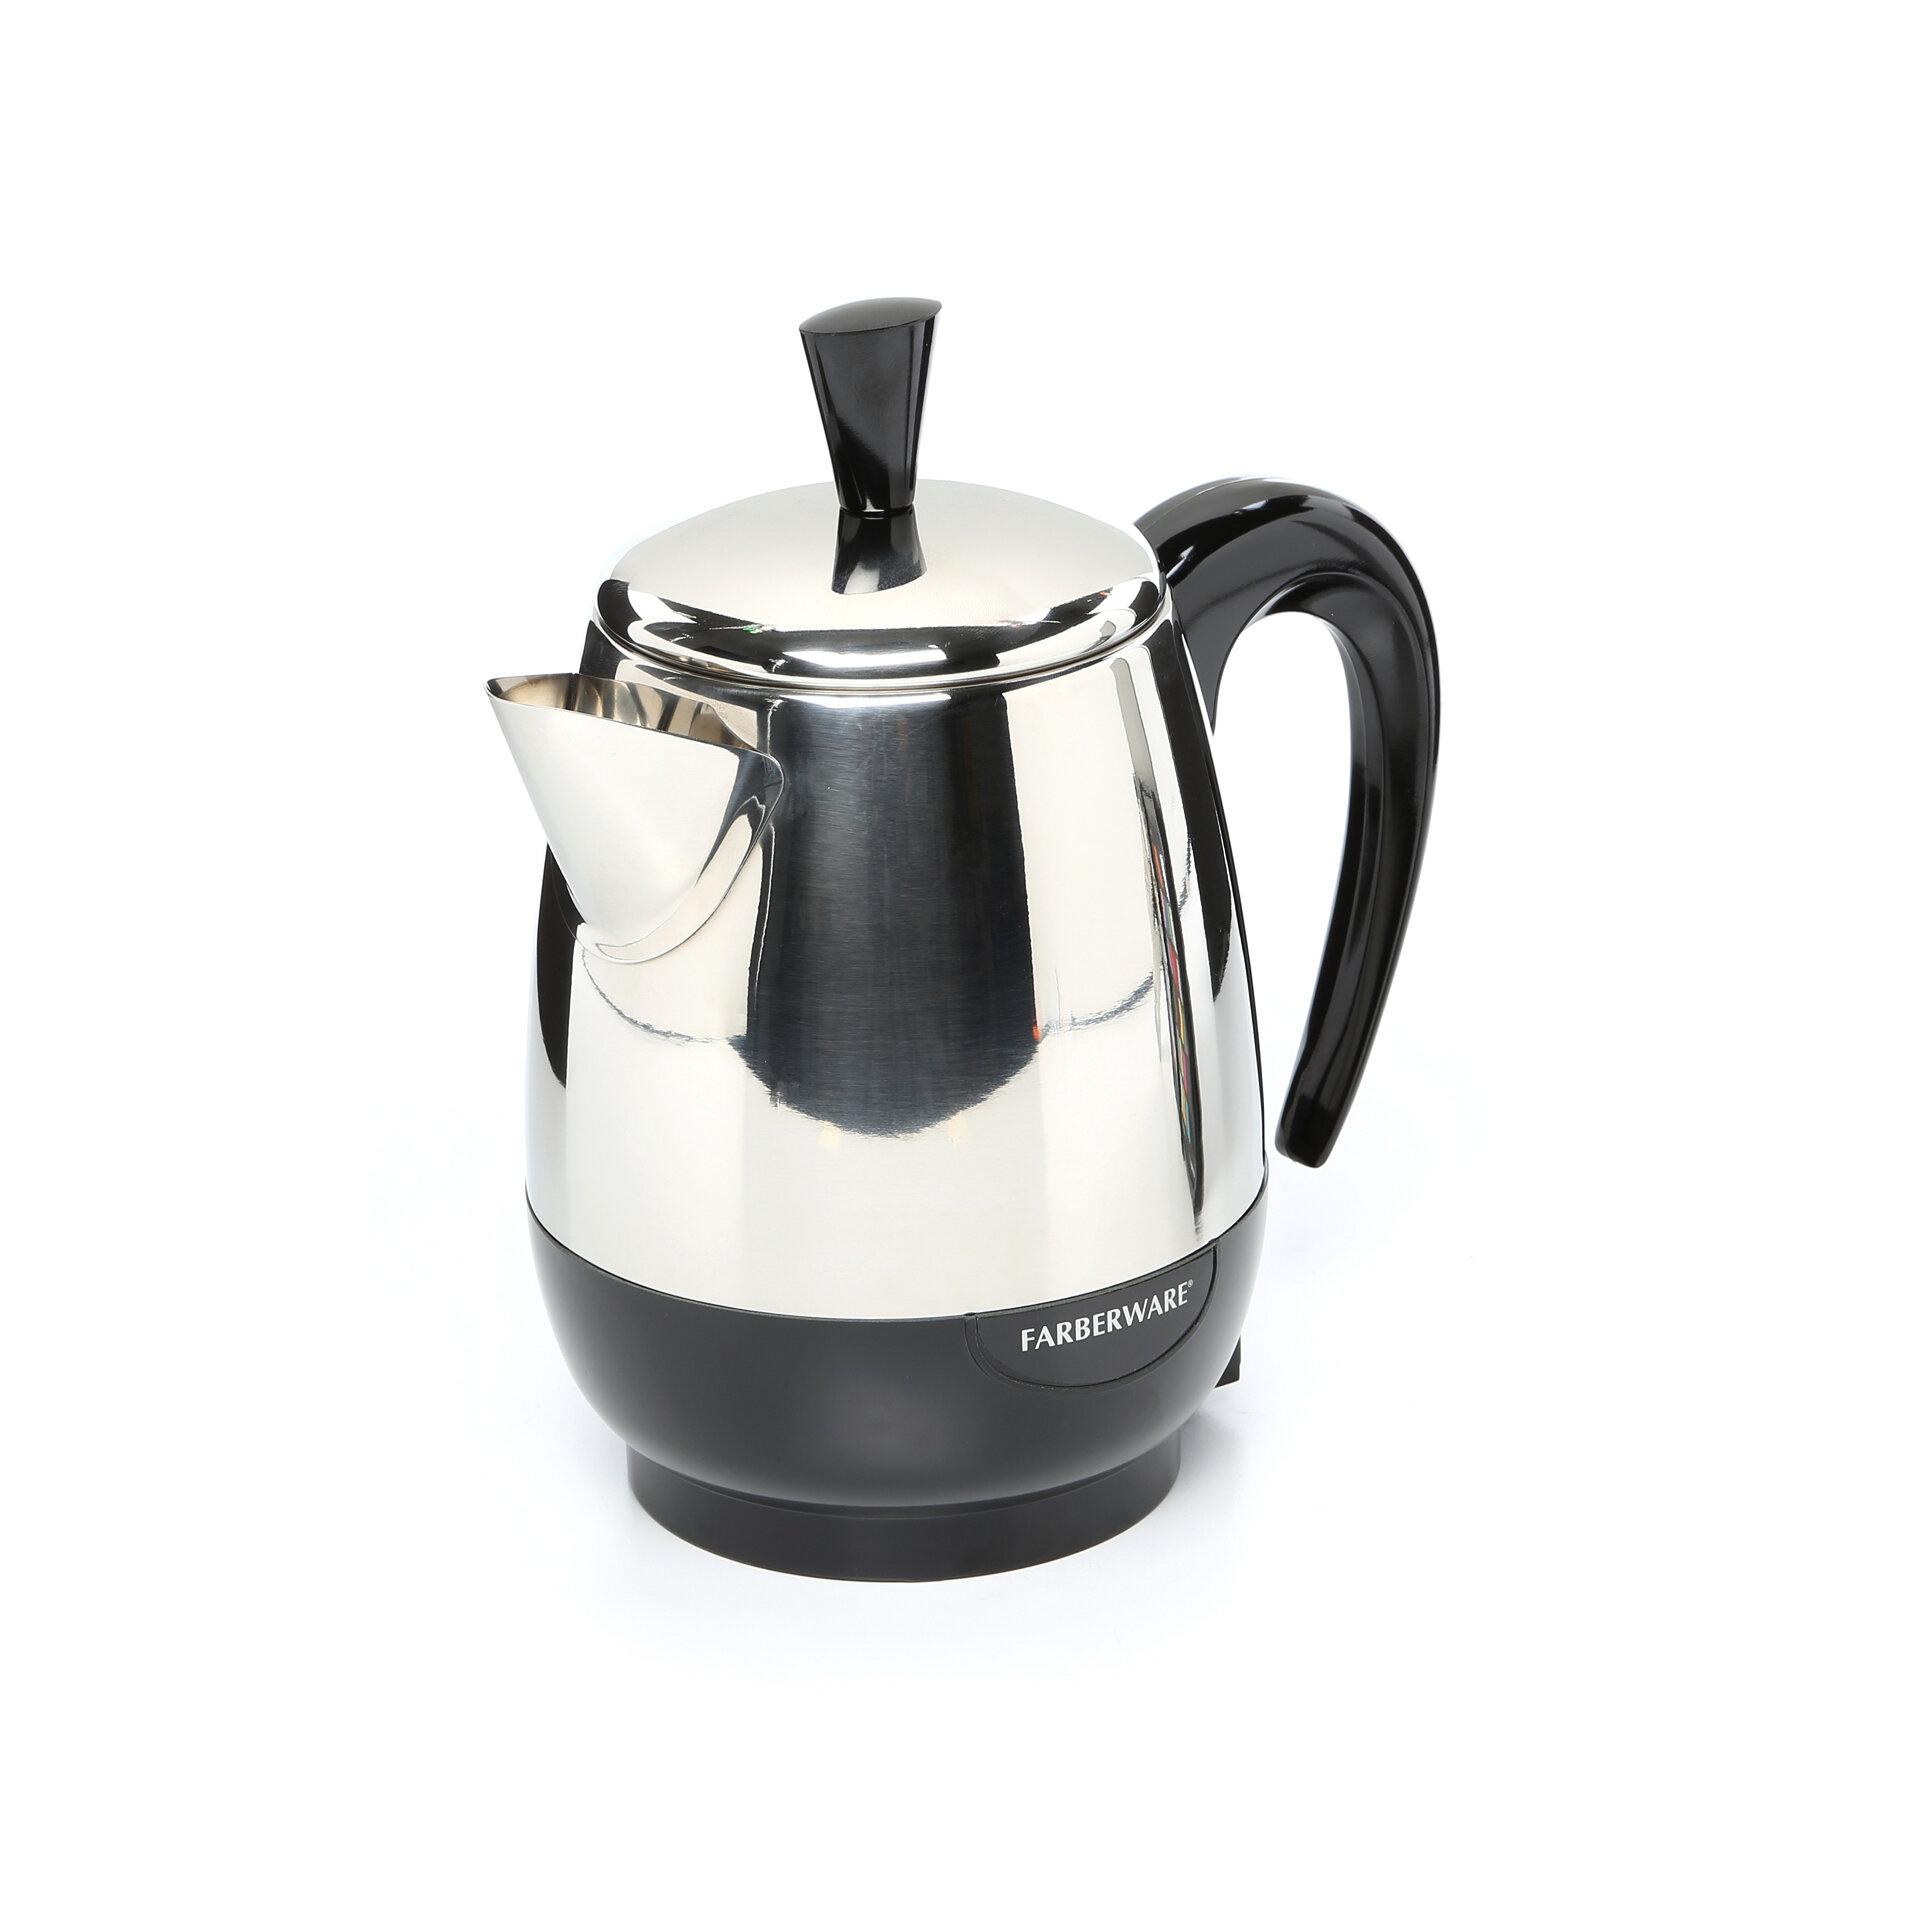 Kitchen+Ease+Percolator farberware kitchen ease percolator & reviews wayfair